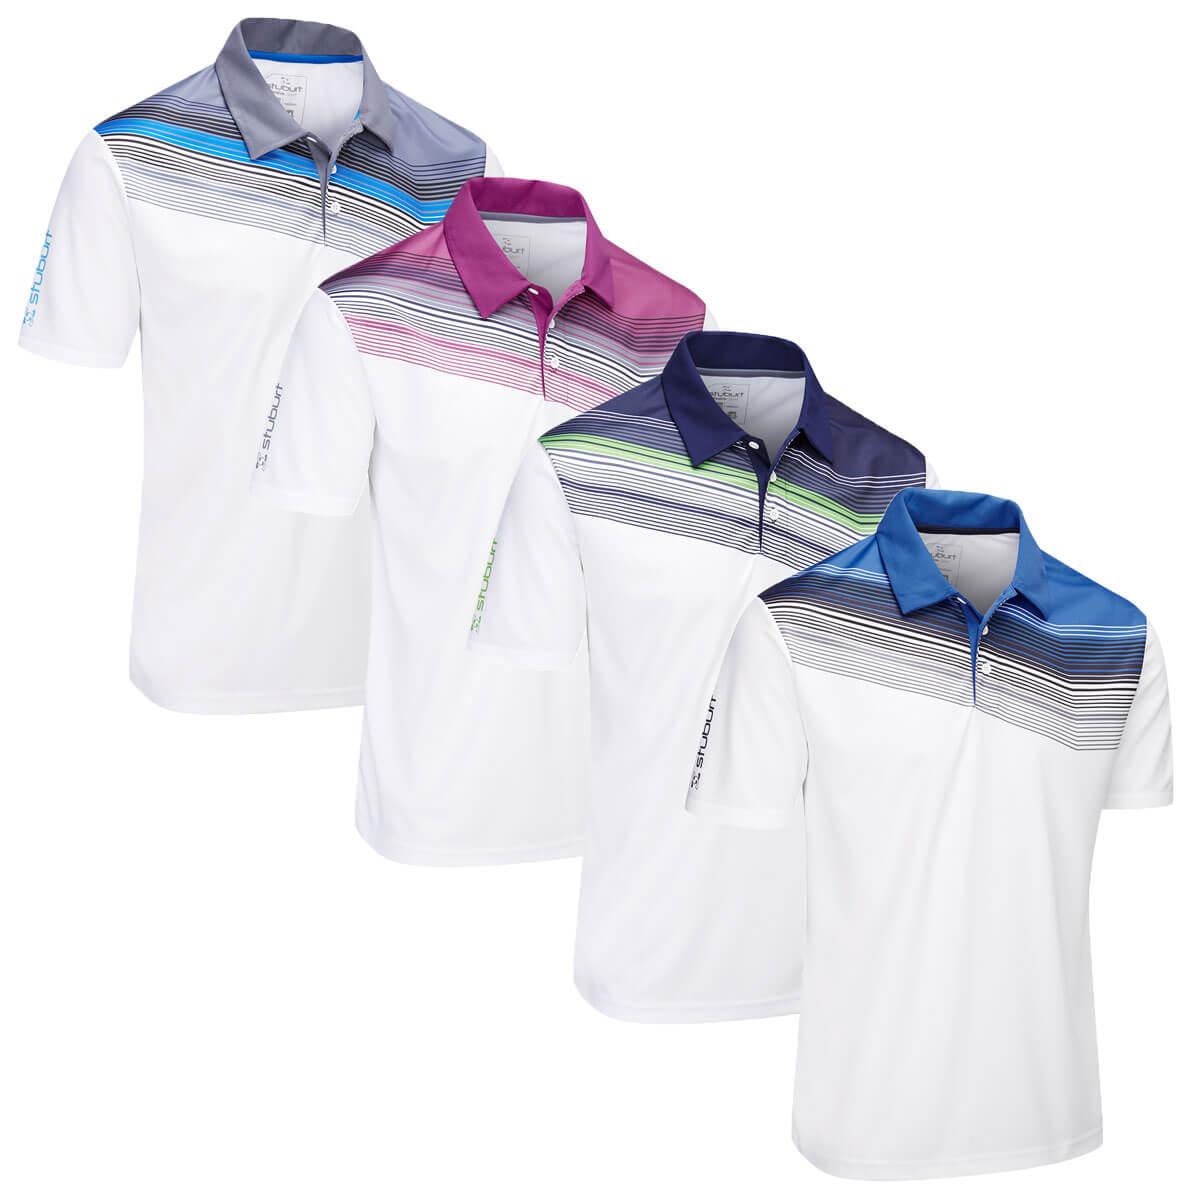 74cab8f61f0e9e Details about Stuburt Mens 2019 Evolve Upton Quick Drying Golf Polo Shirt